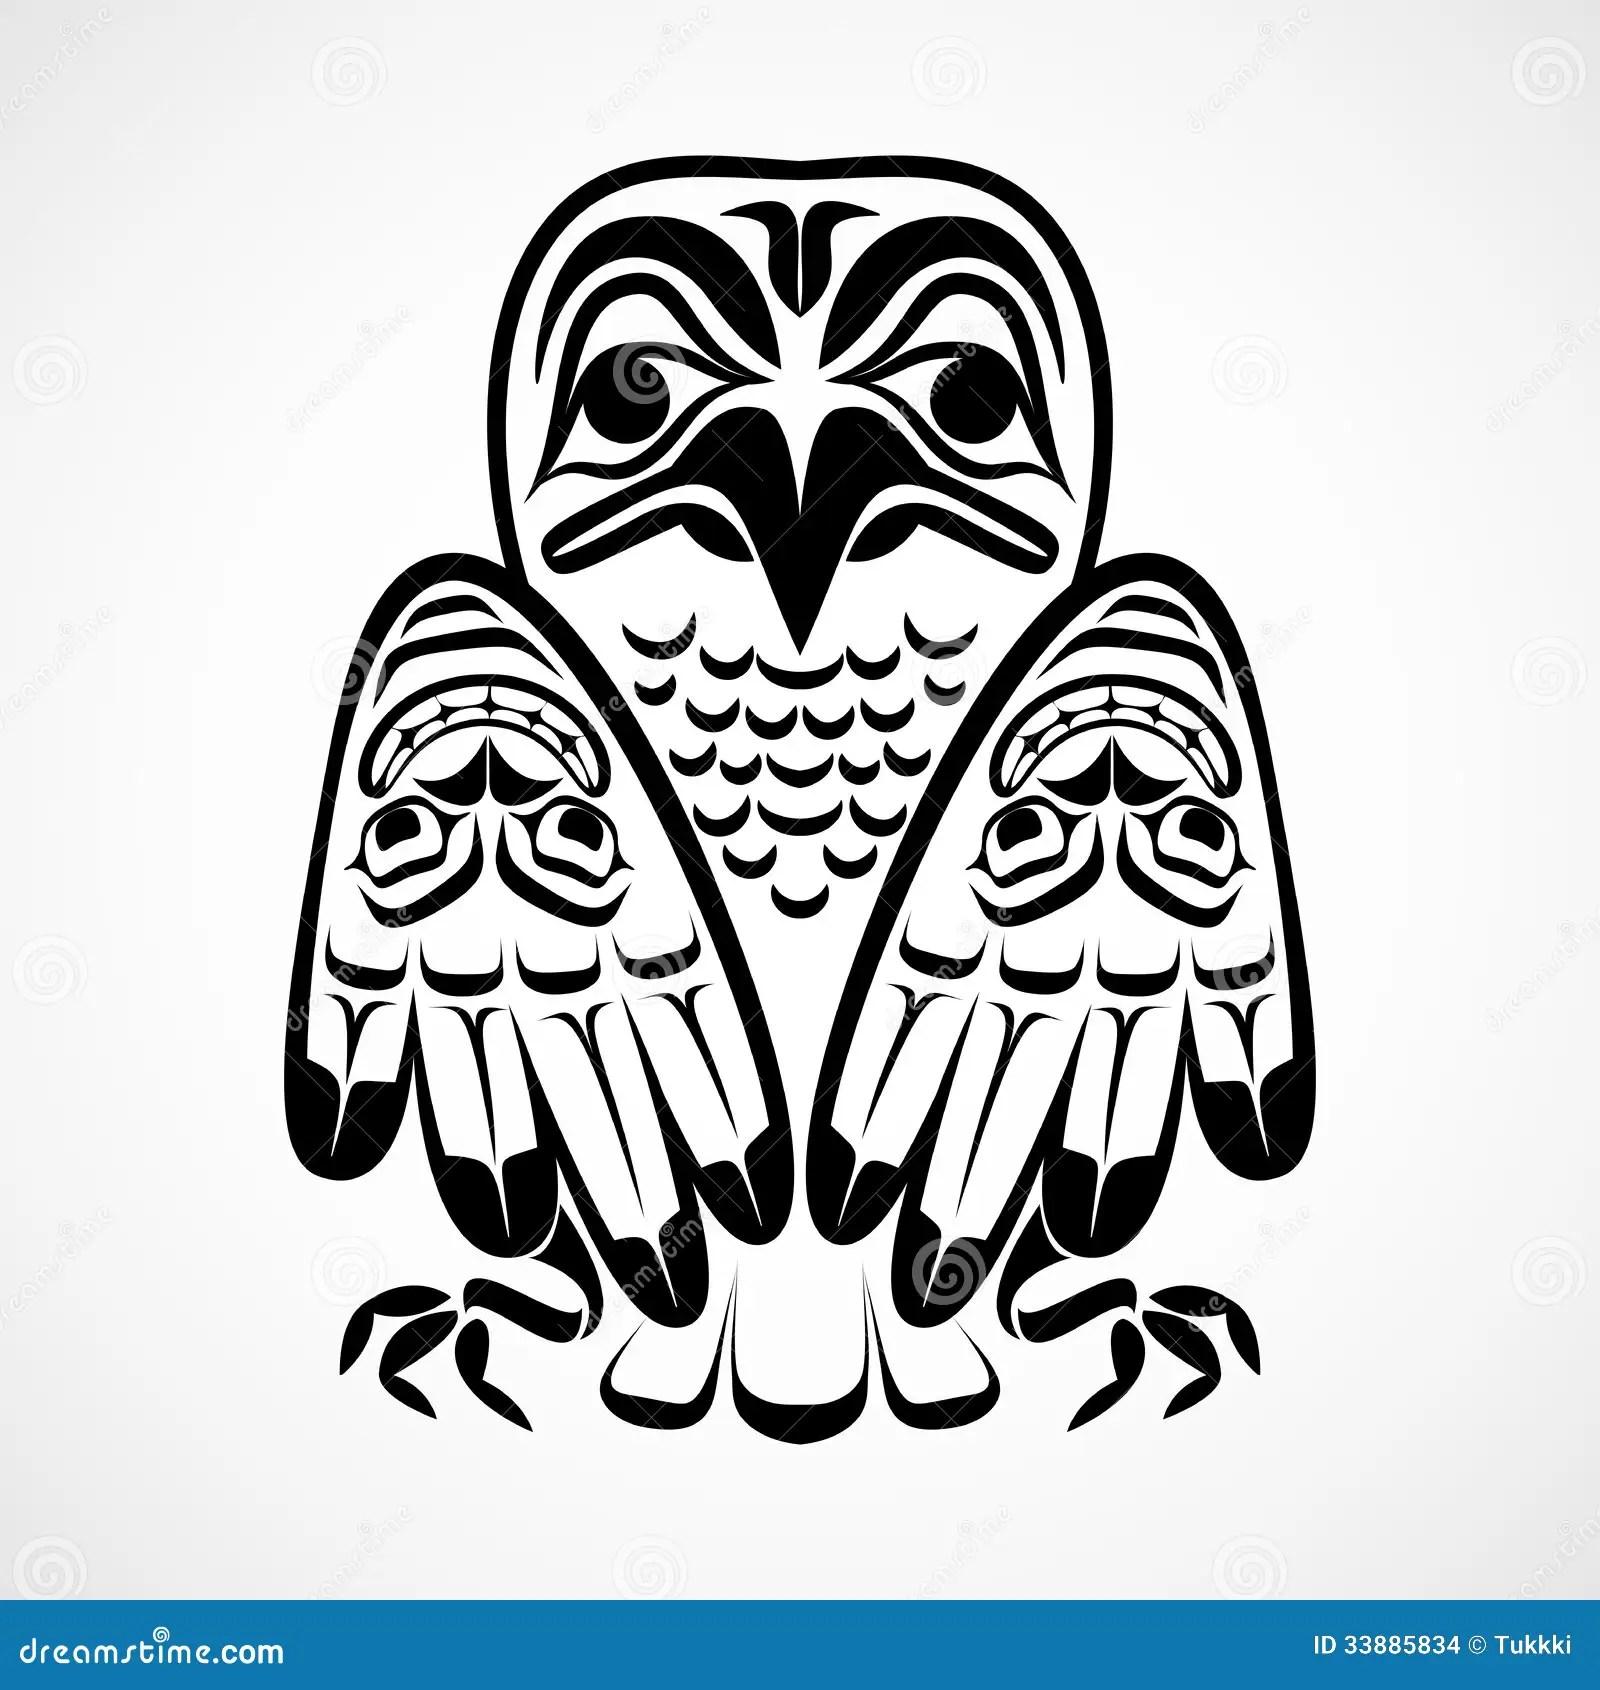 Vector Illustration Of An Eagle. Vector Illustration